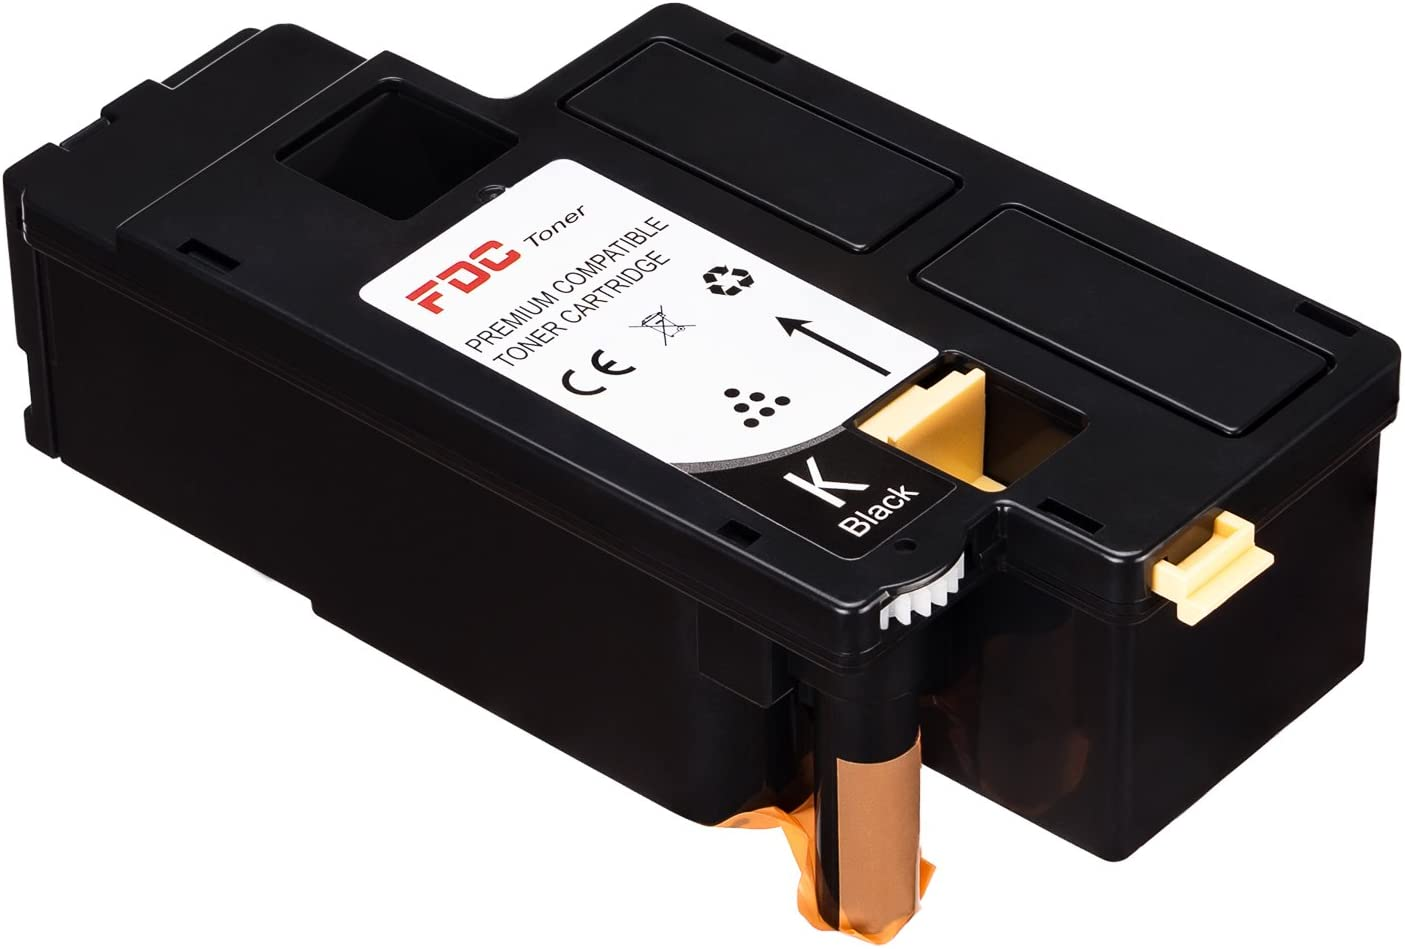 FDC Toner Compatible Dell E525W Printers Toner Cartridges 1 Pack Replacement for Black 593-BBJX, H3M8P, DPV4T